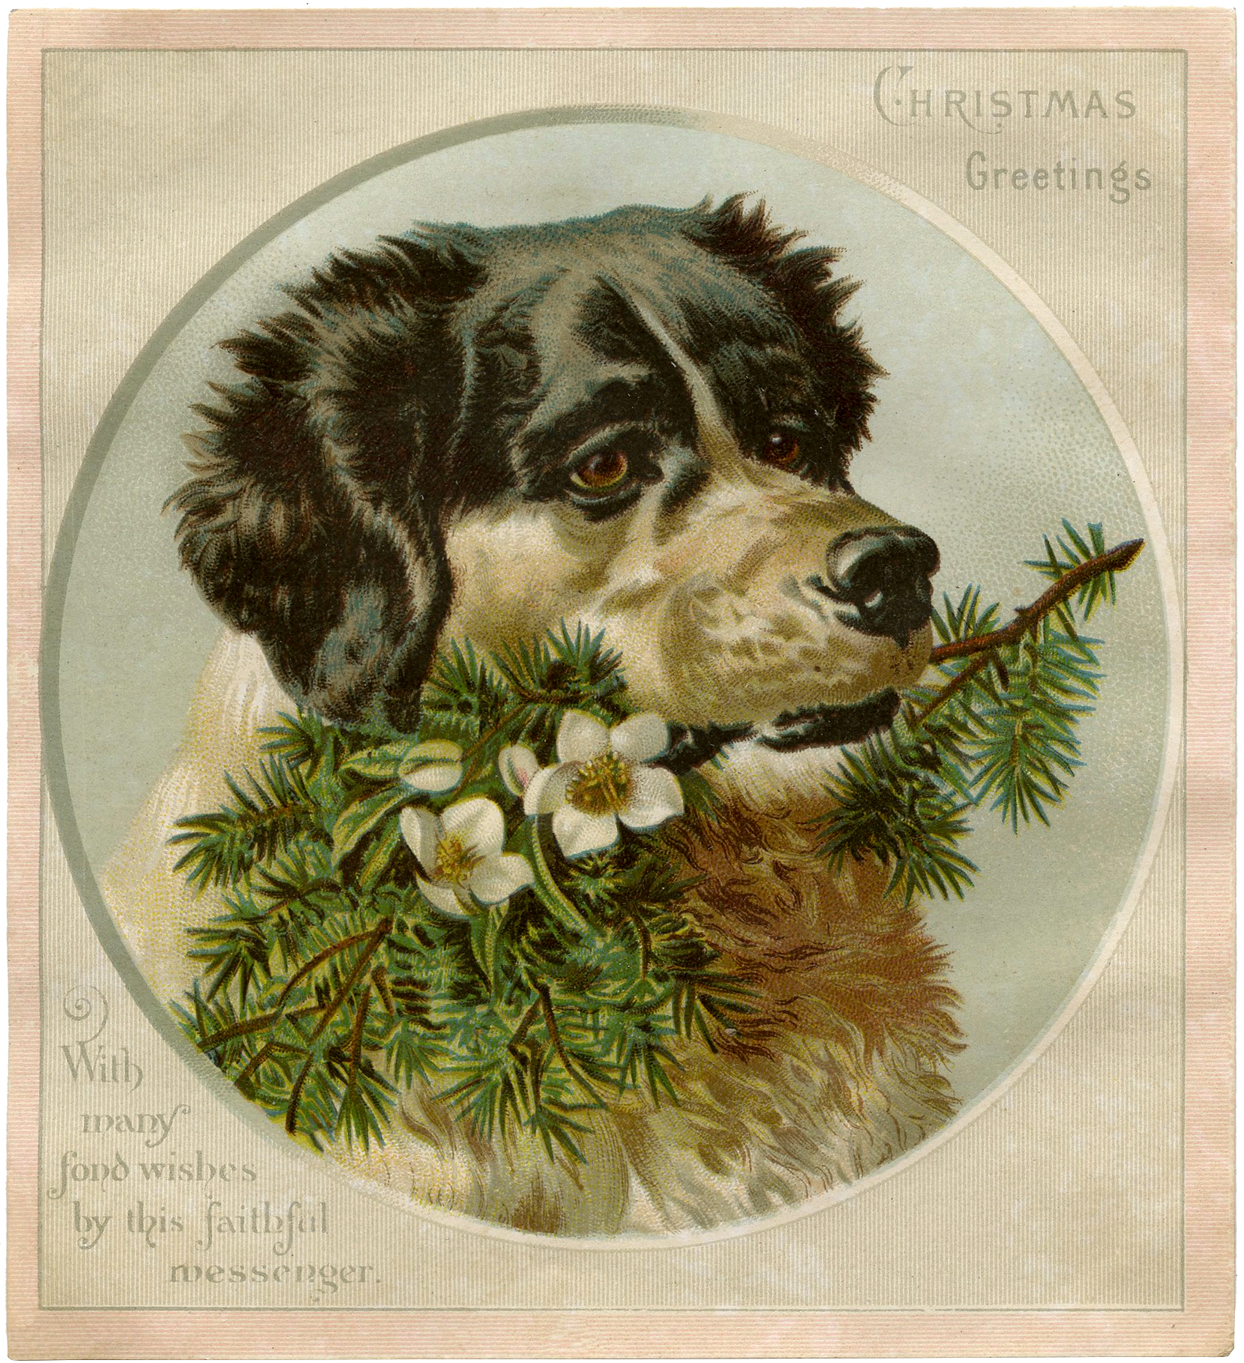 Vintage Christmas Dog Image The Graphics Fairy